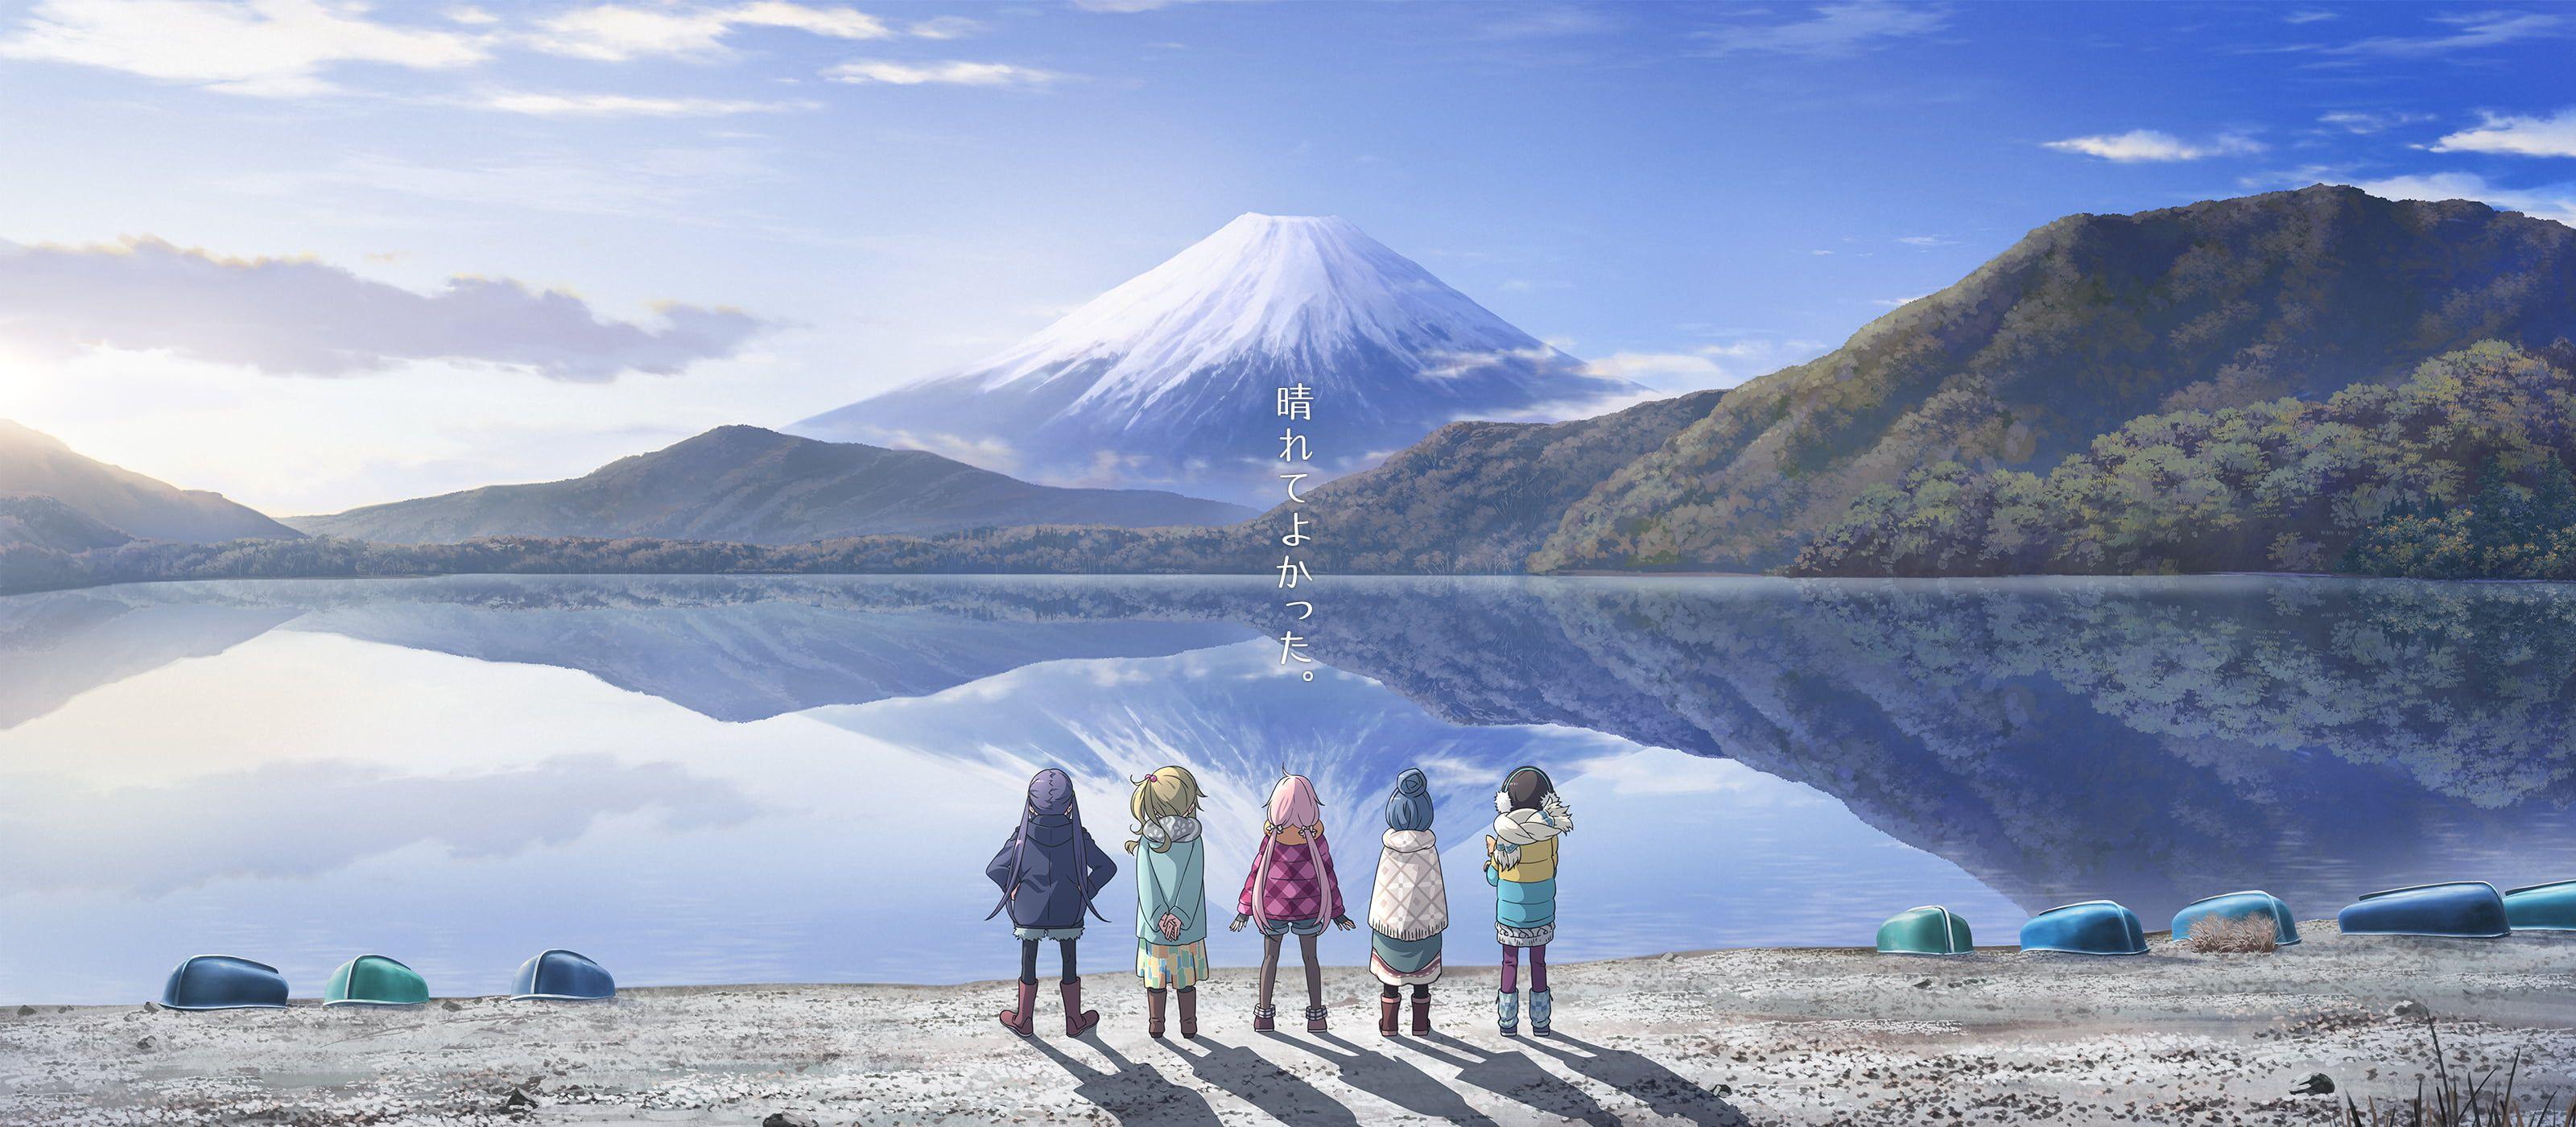 Rin Shima Nadeshiko Kagamihara Aoi Inuyama Chiaki Oogaki Anime Girls Yuru Camp Anime Ena Saitou 2k Wallpaper Hdwallpape Wallpaper Desktop Wallpaper Camping